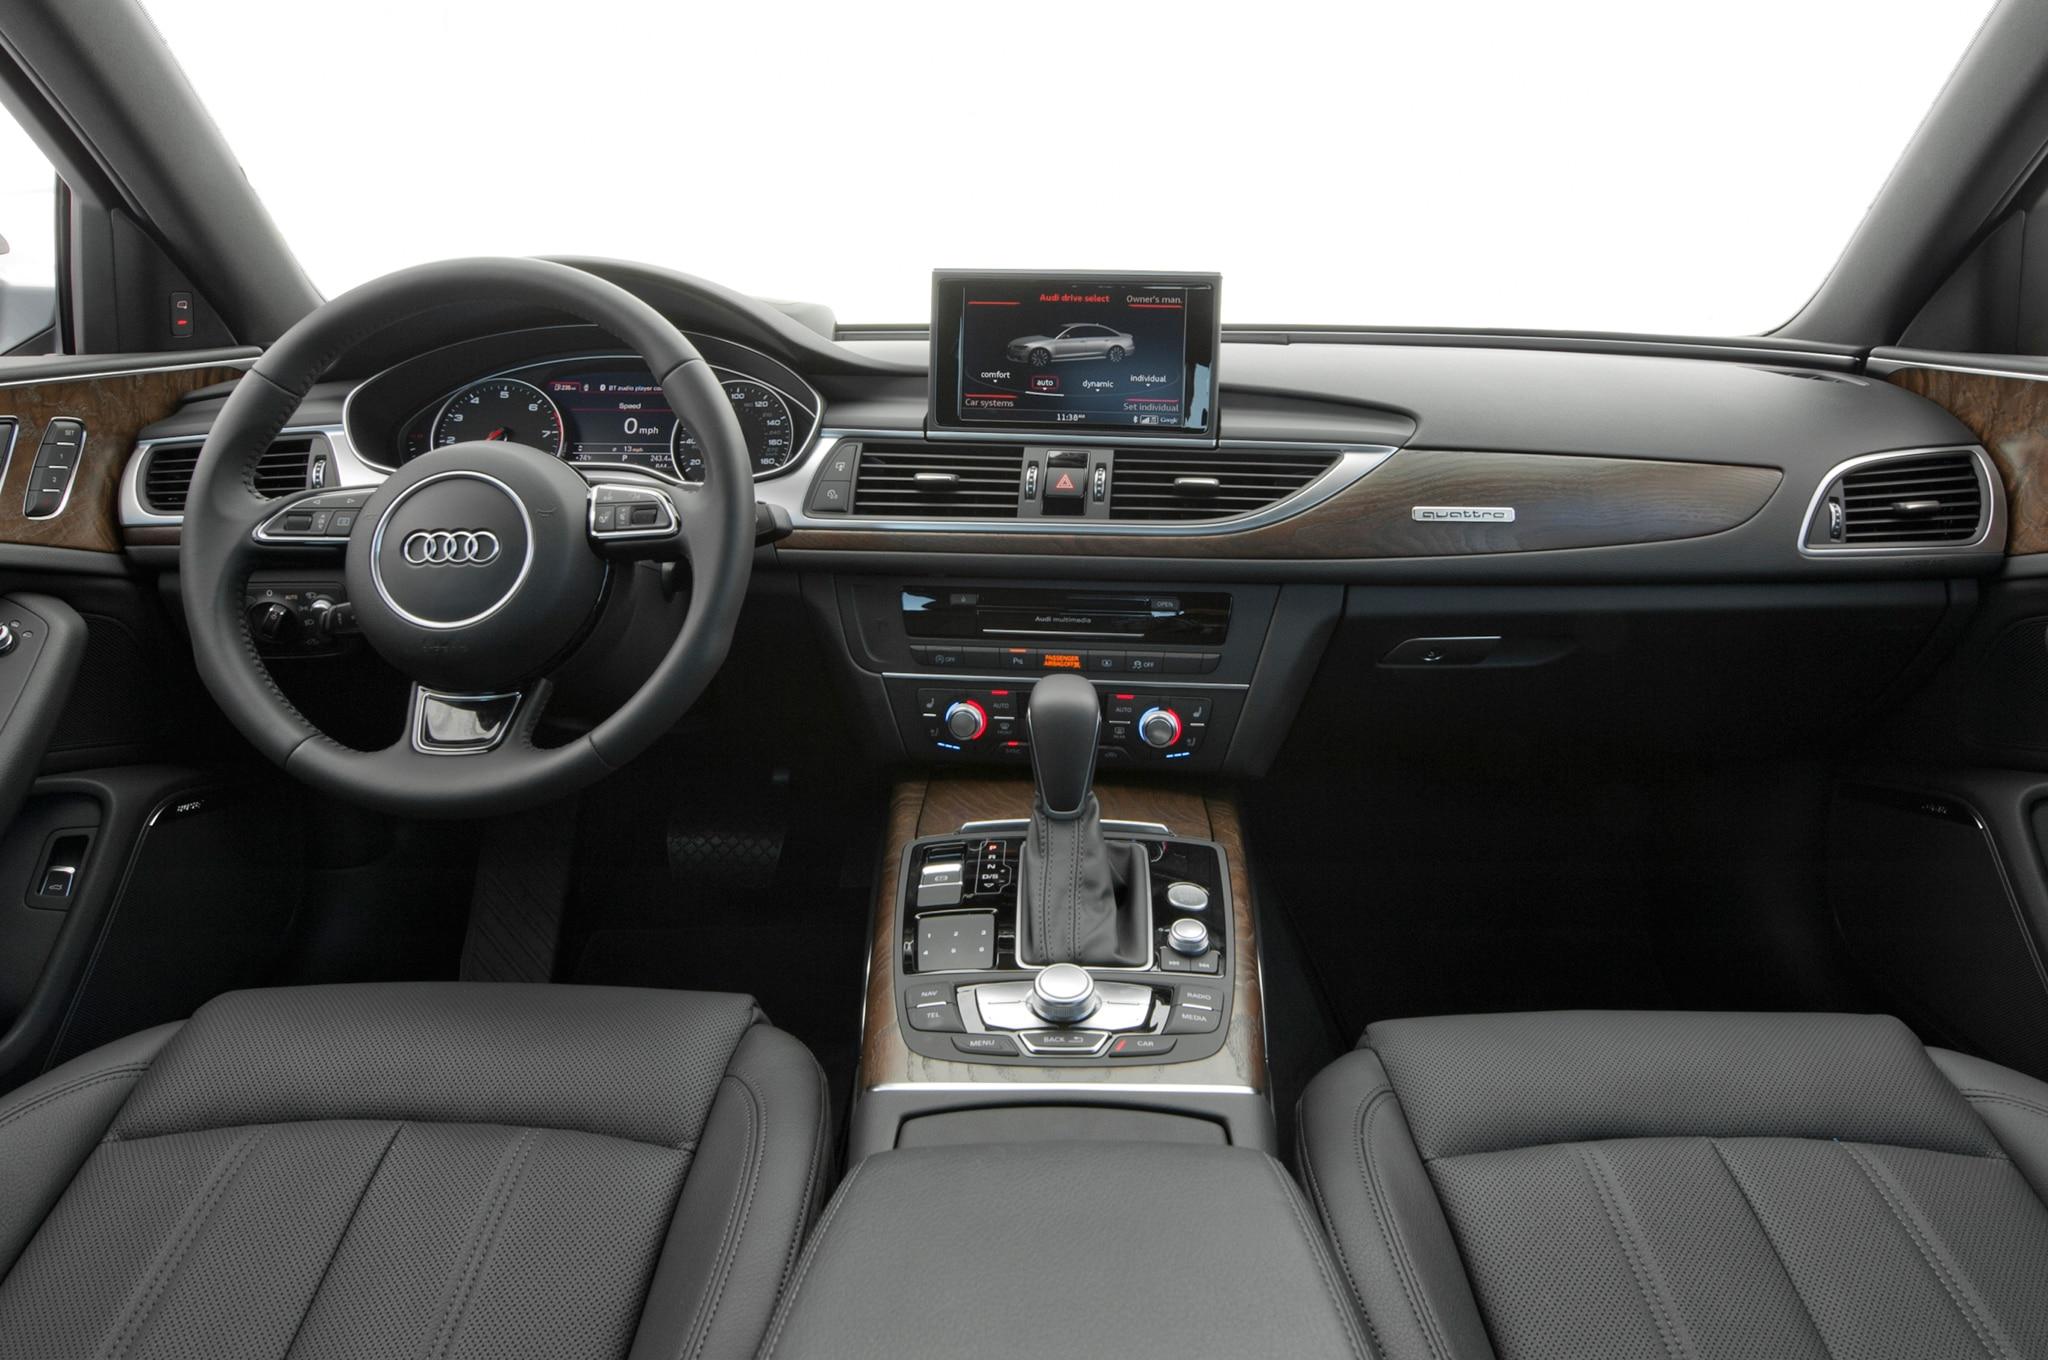 Audi A1 Review Top Gear | 2017 - 2018 Cars Reviews